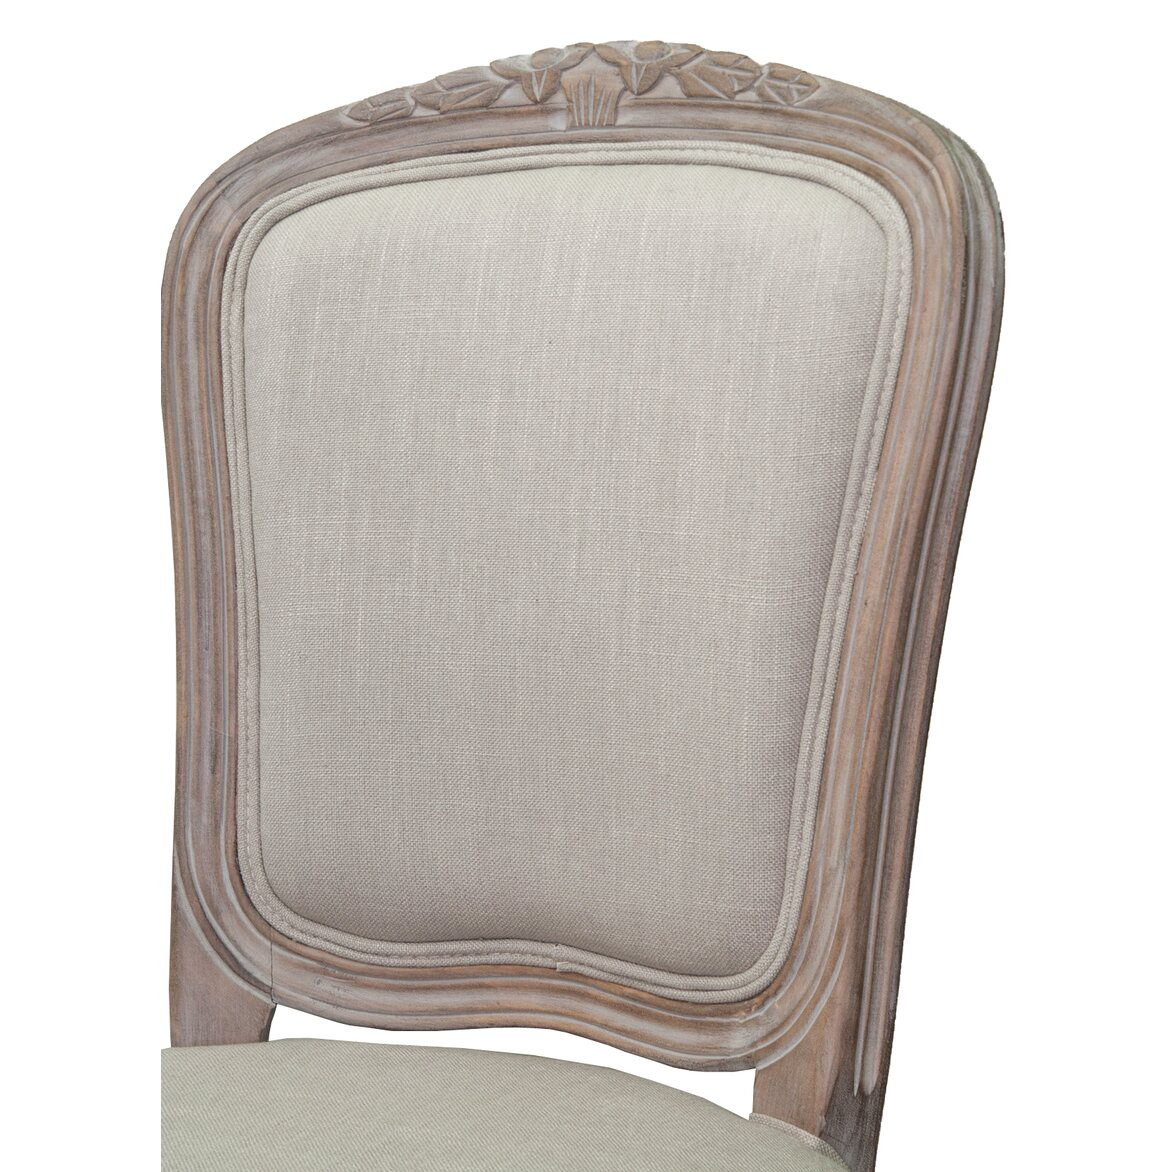 Стул Gran beige 5 | Обеденные стулья Kingsby